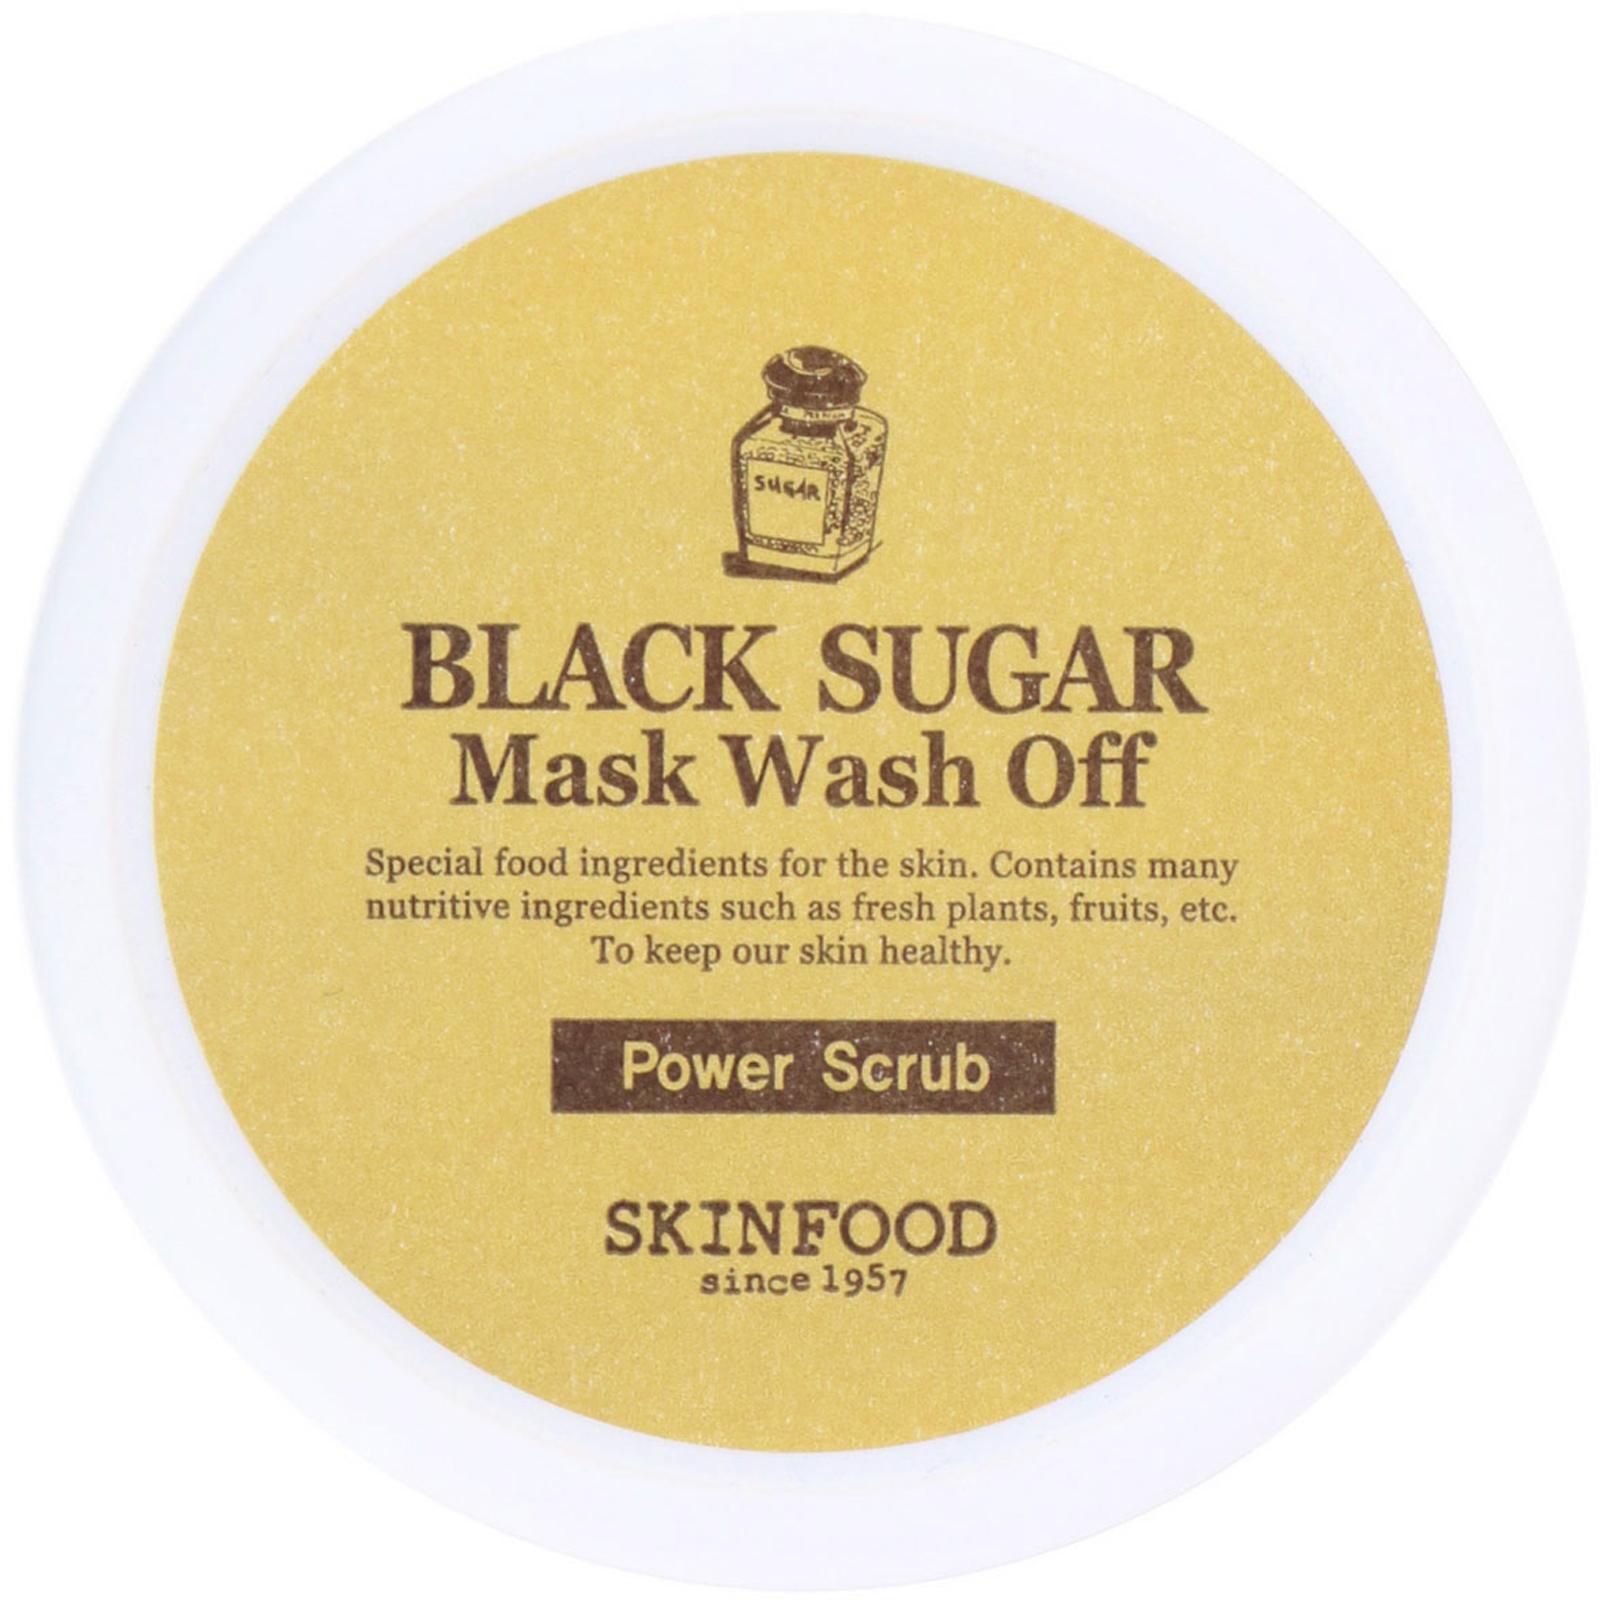 Black Sugar Mask Wash Off by Skinfood #13